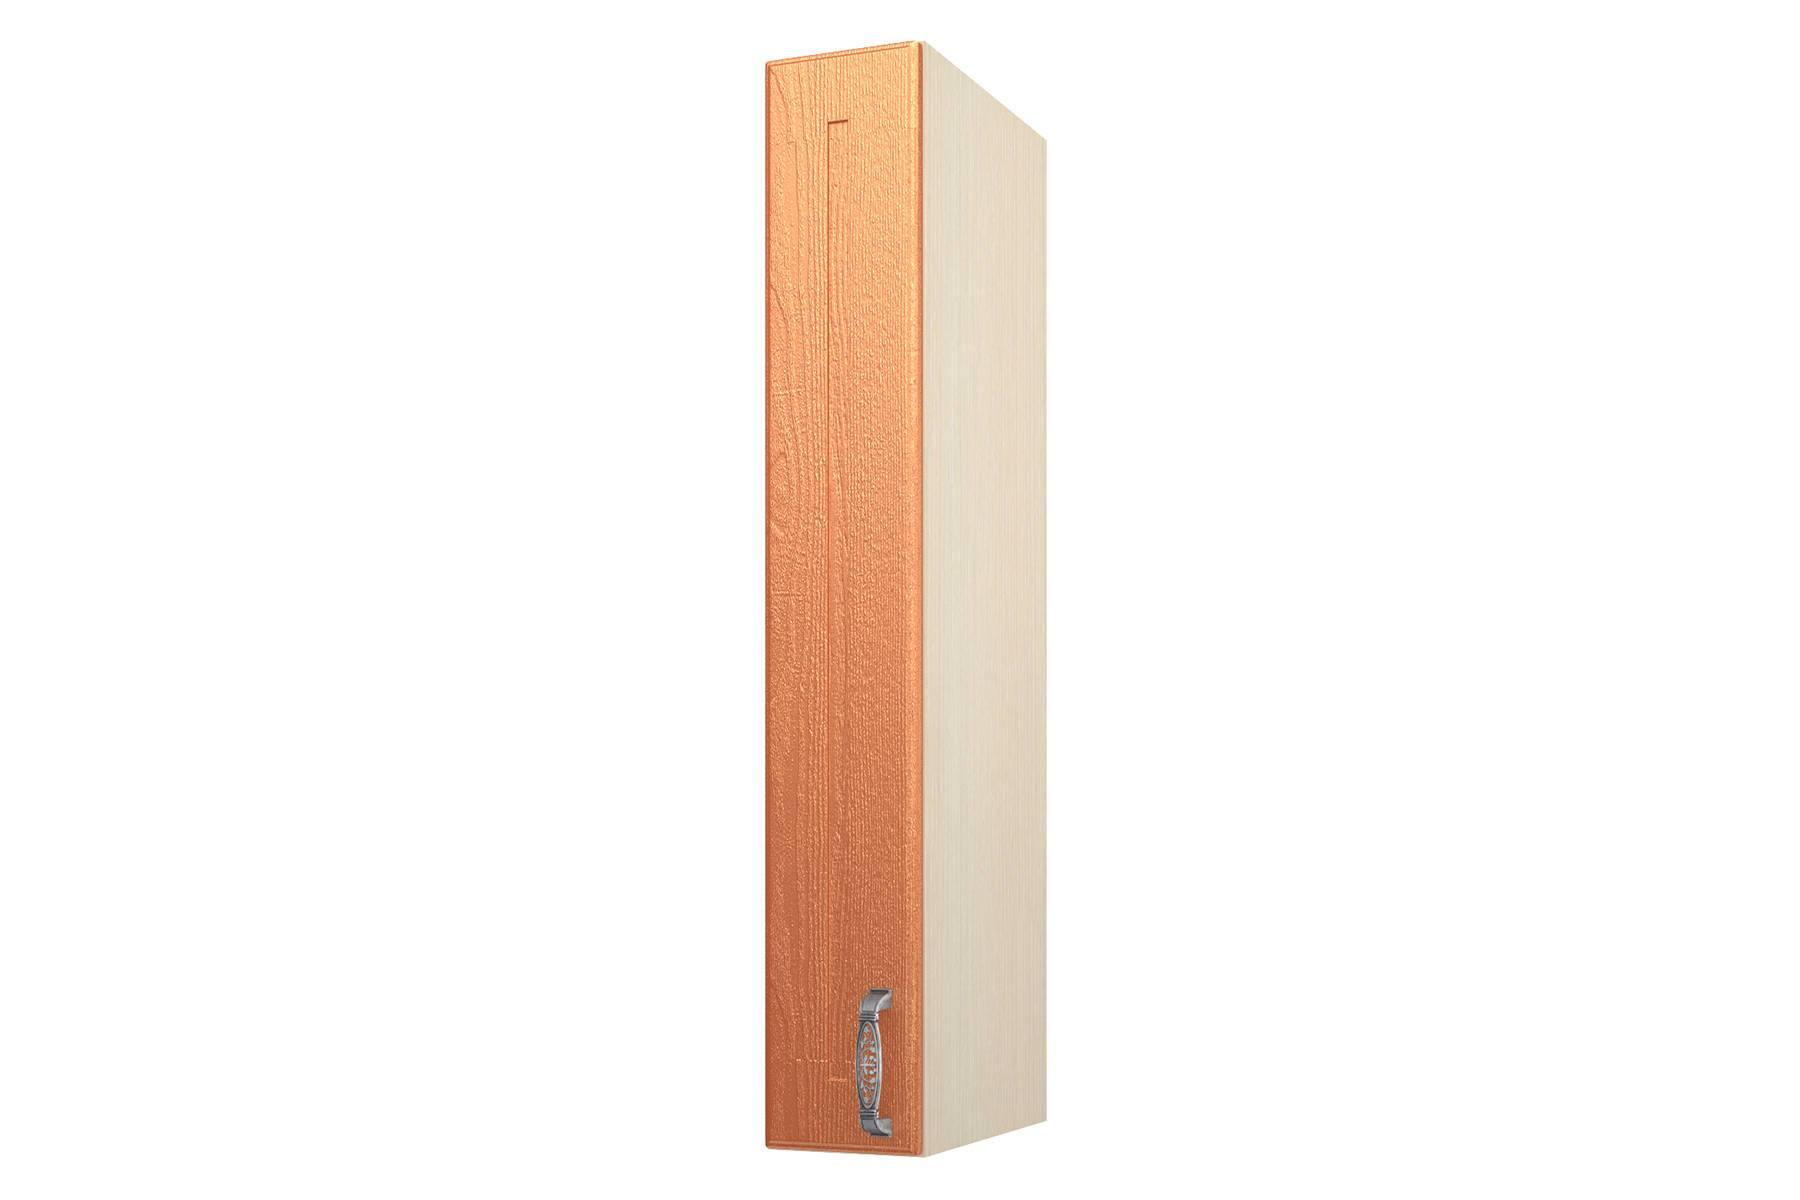 Равенна ART Шкаф навесной 15, (Н-96), 1 дверь равенна art шкаф навесной 40 н 96 1 дверь